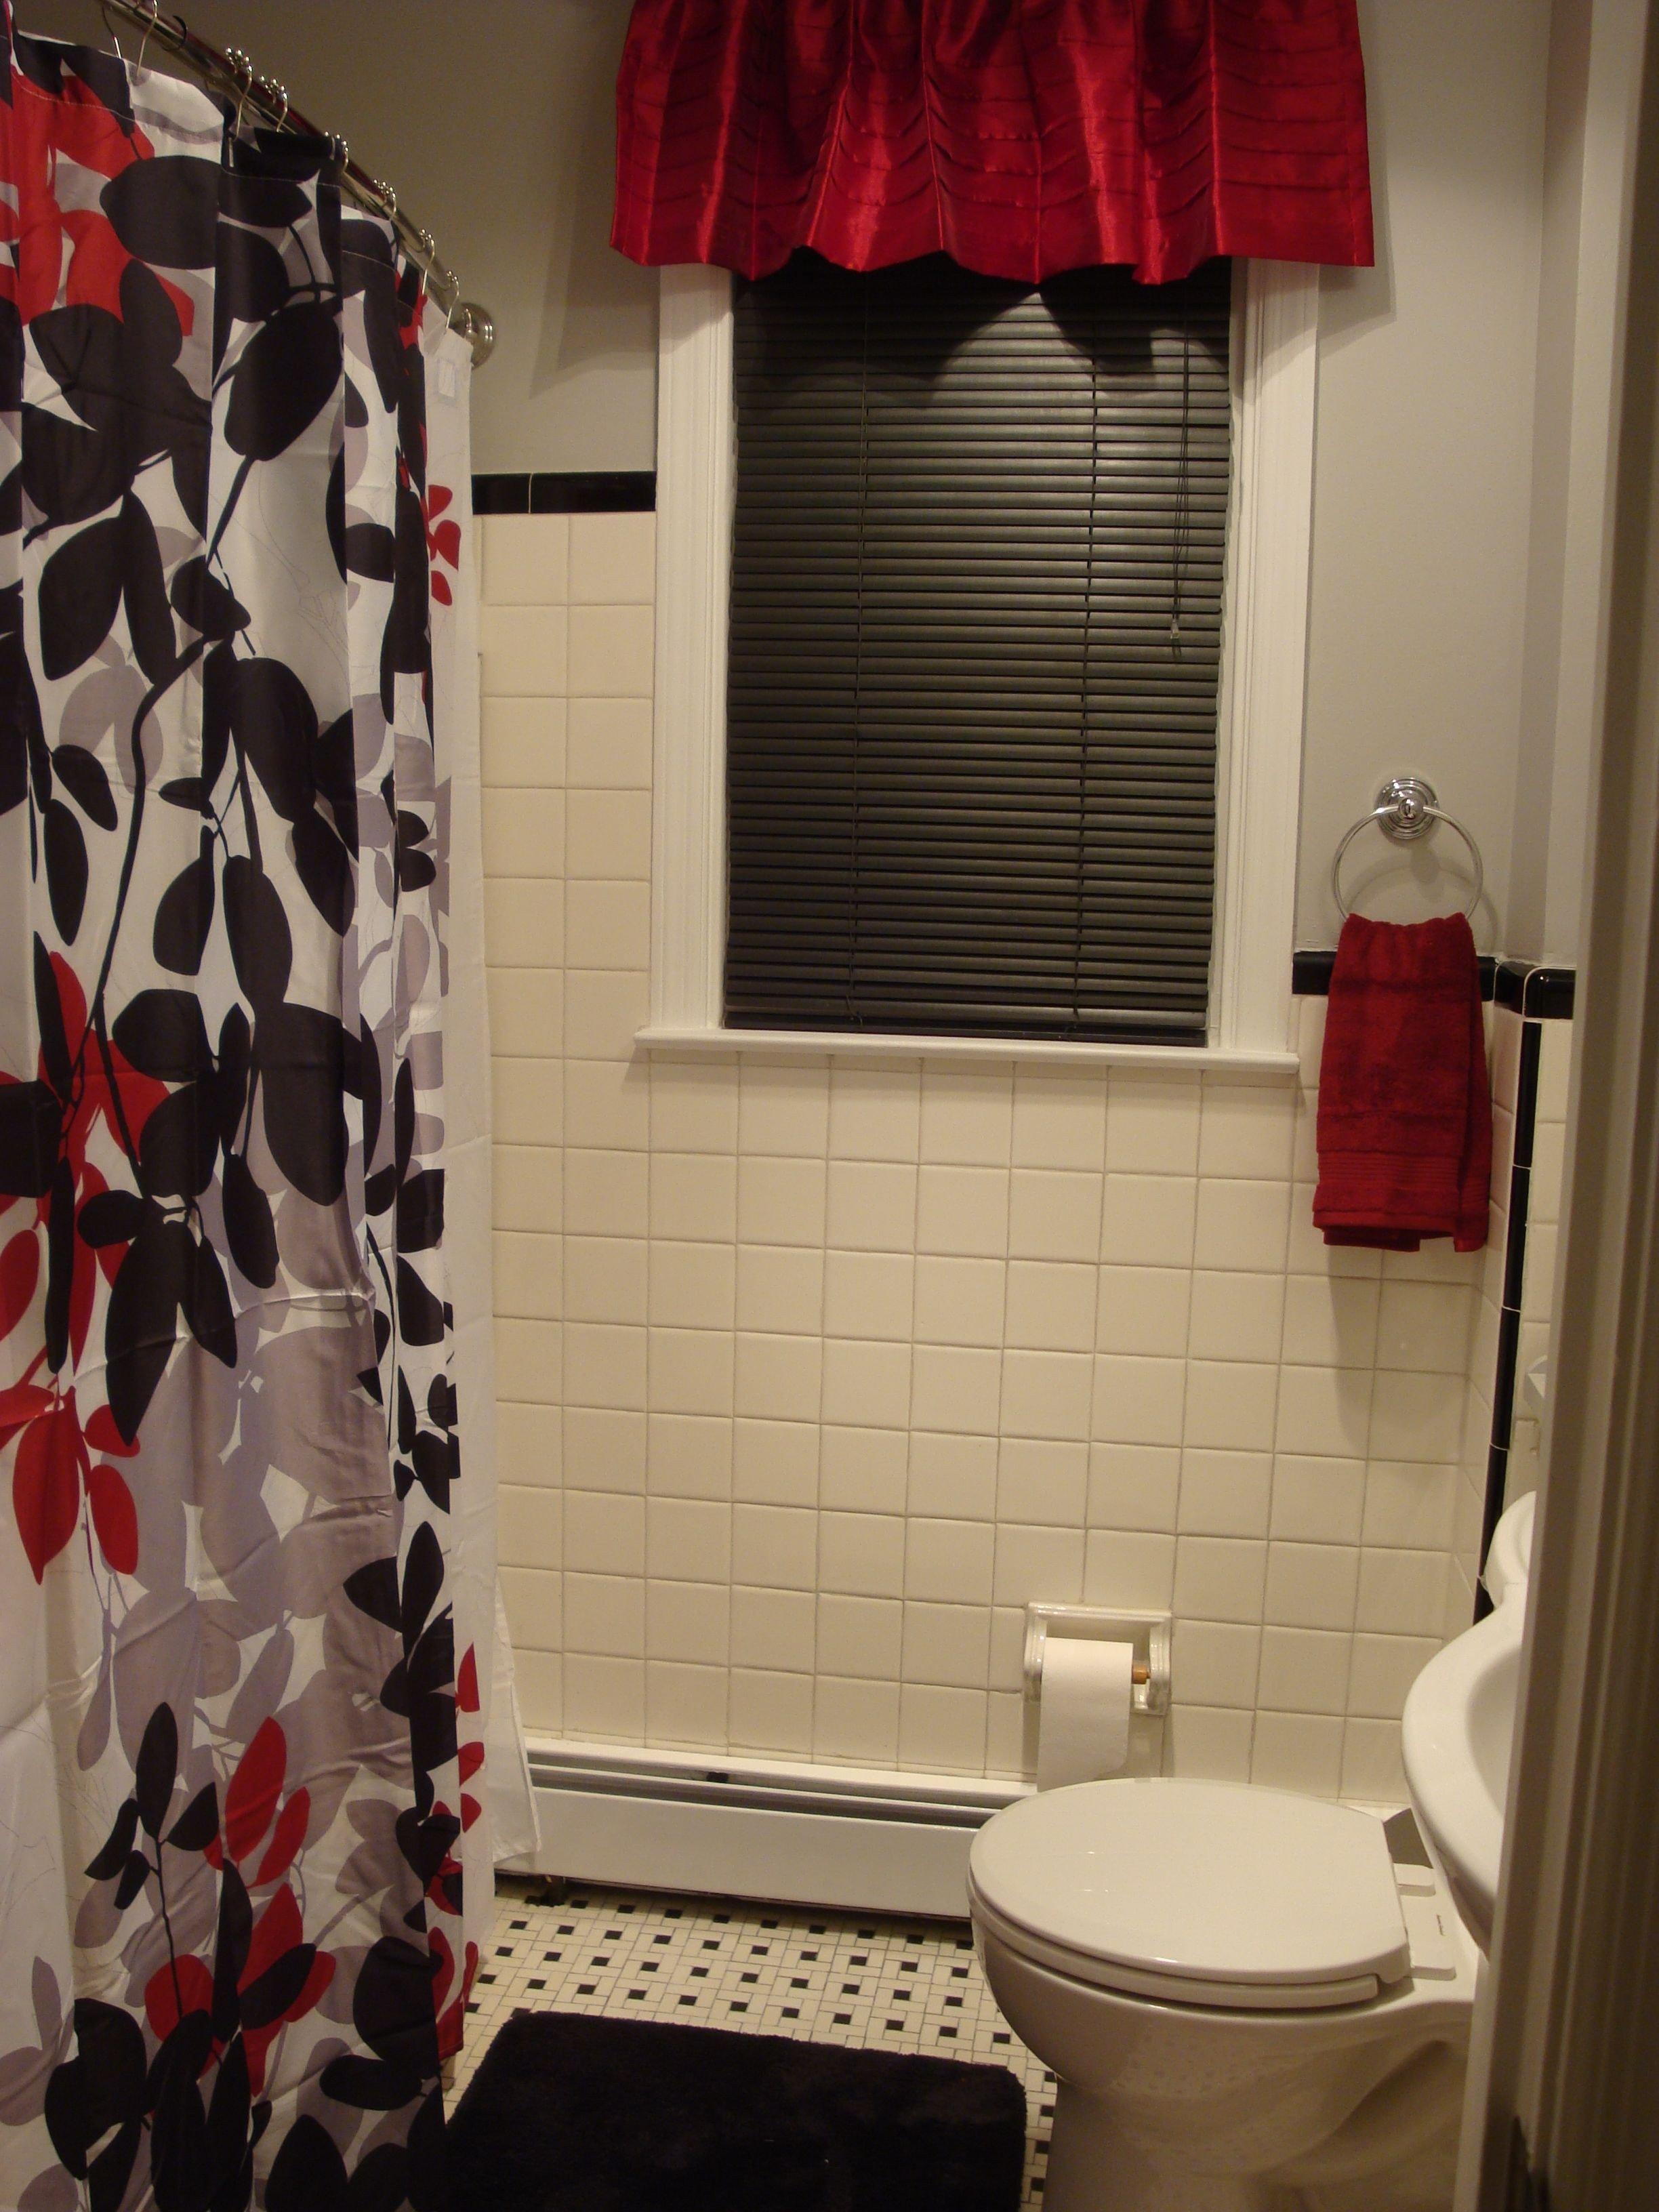 Red and Black Bathroom Decor Luxury Black Red Gray & White Bathroom I Love It Bathroom